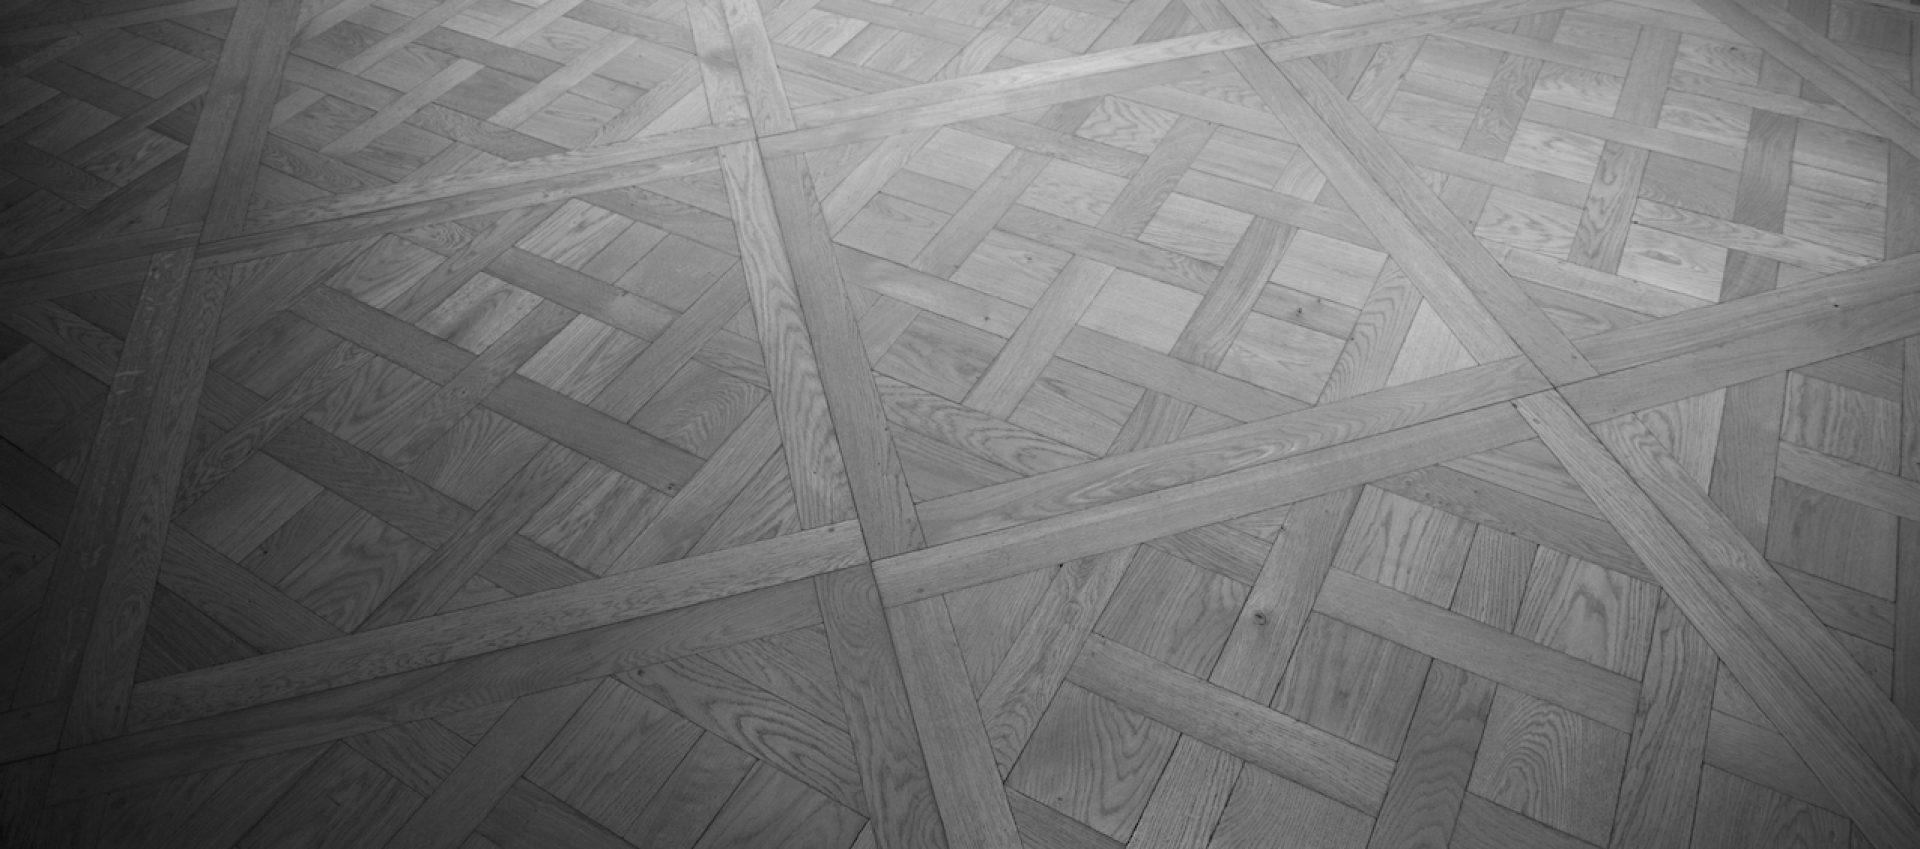 cropped-px-versailles-copie-3